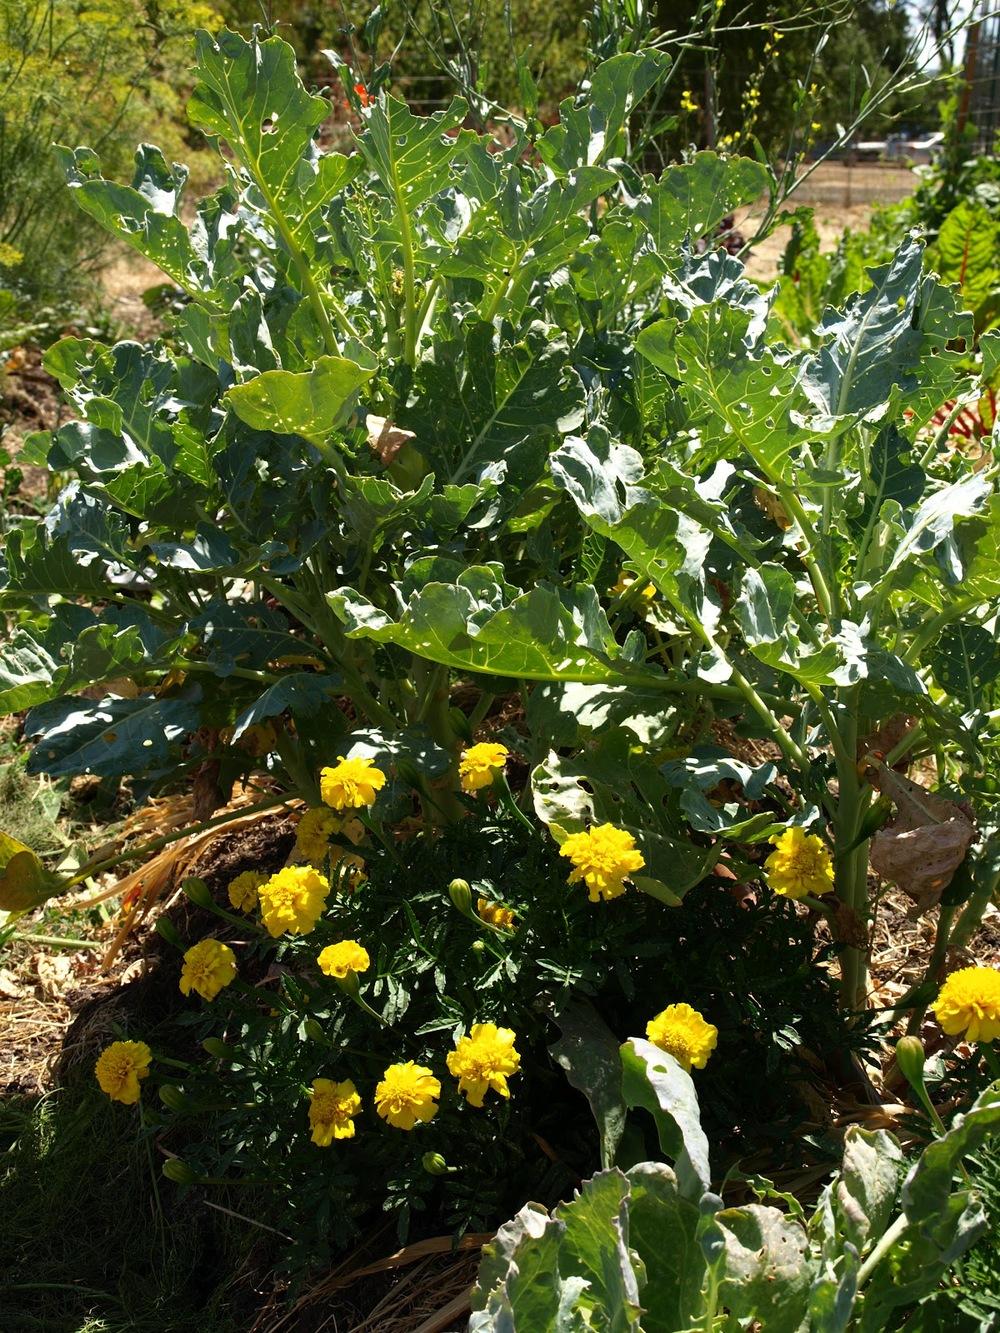 Broccoli and marigolds